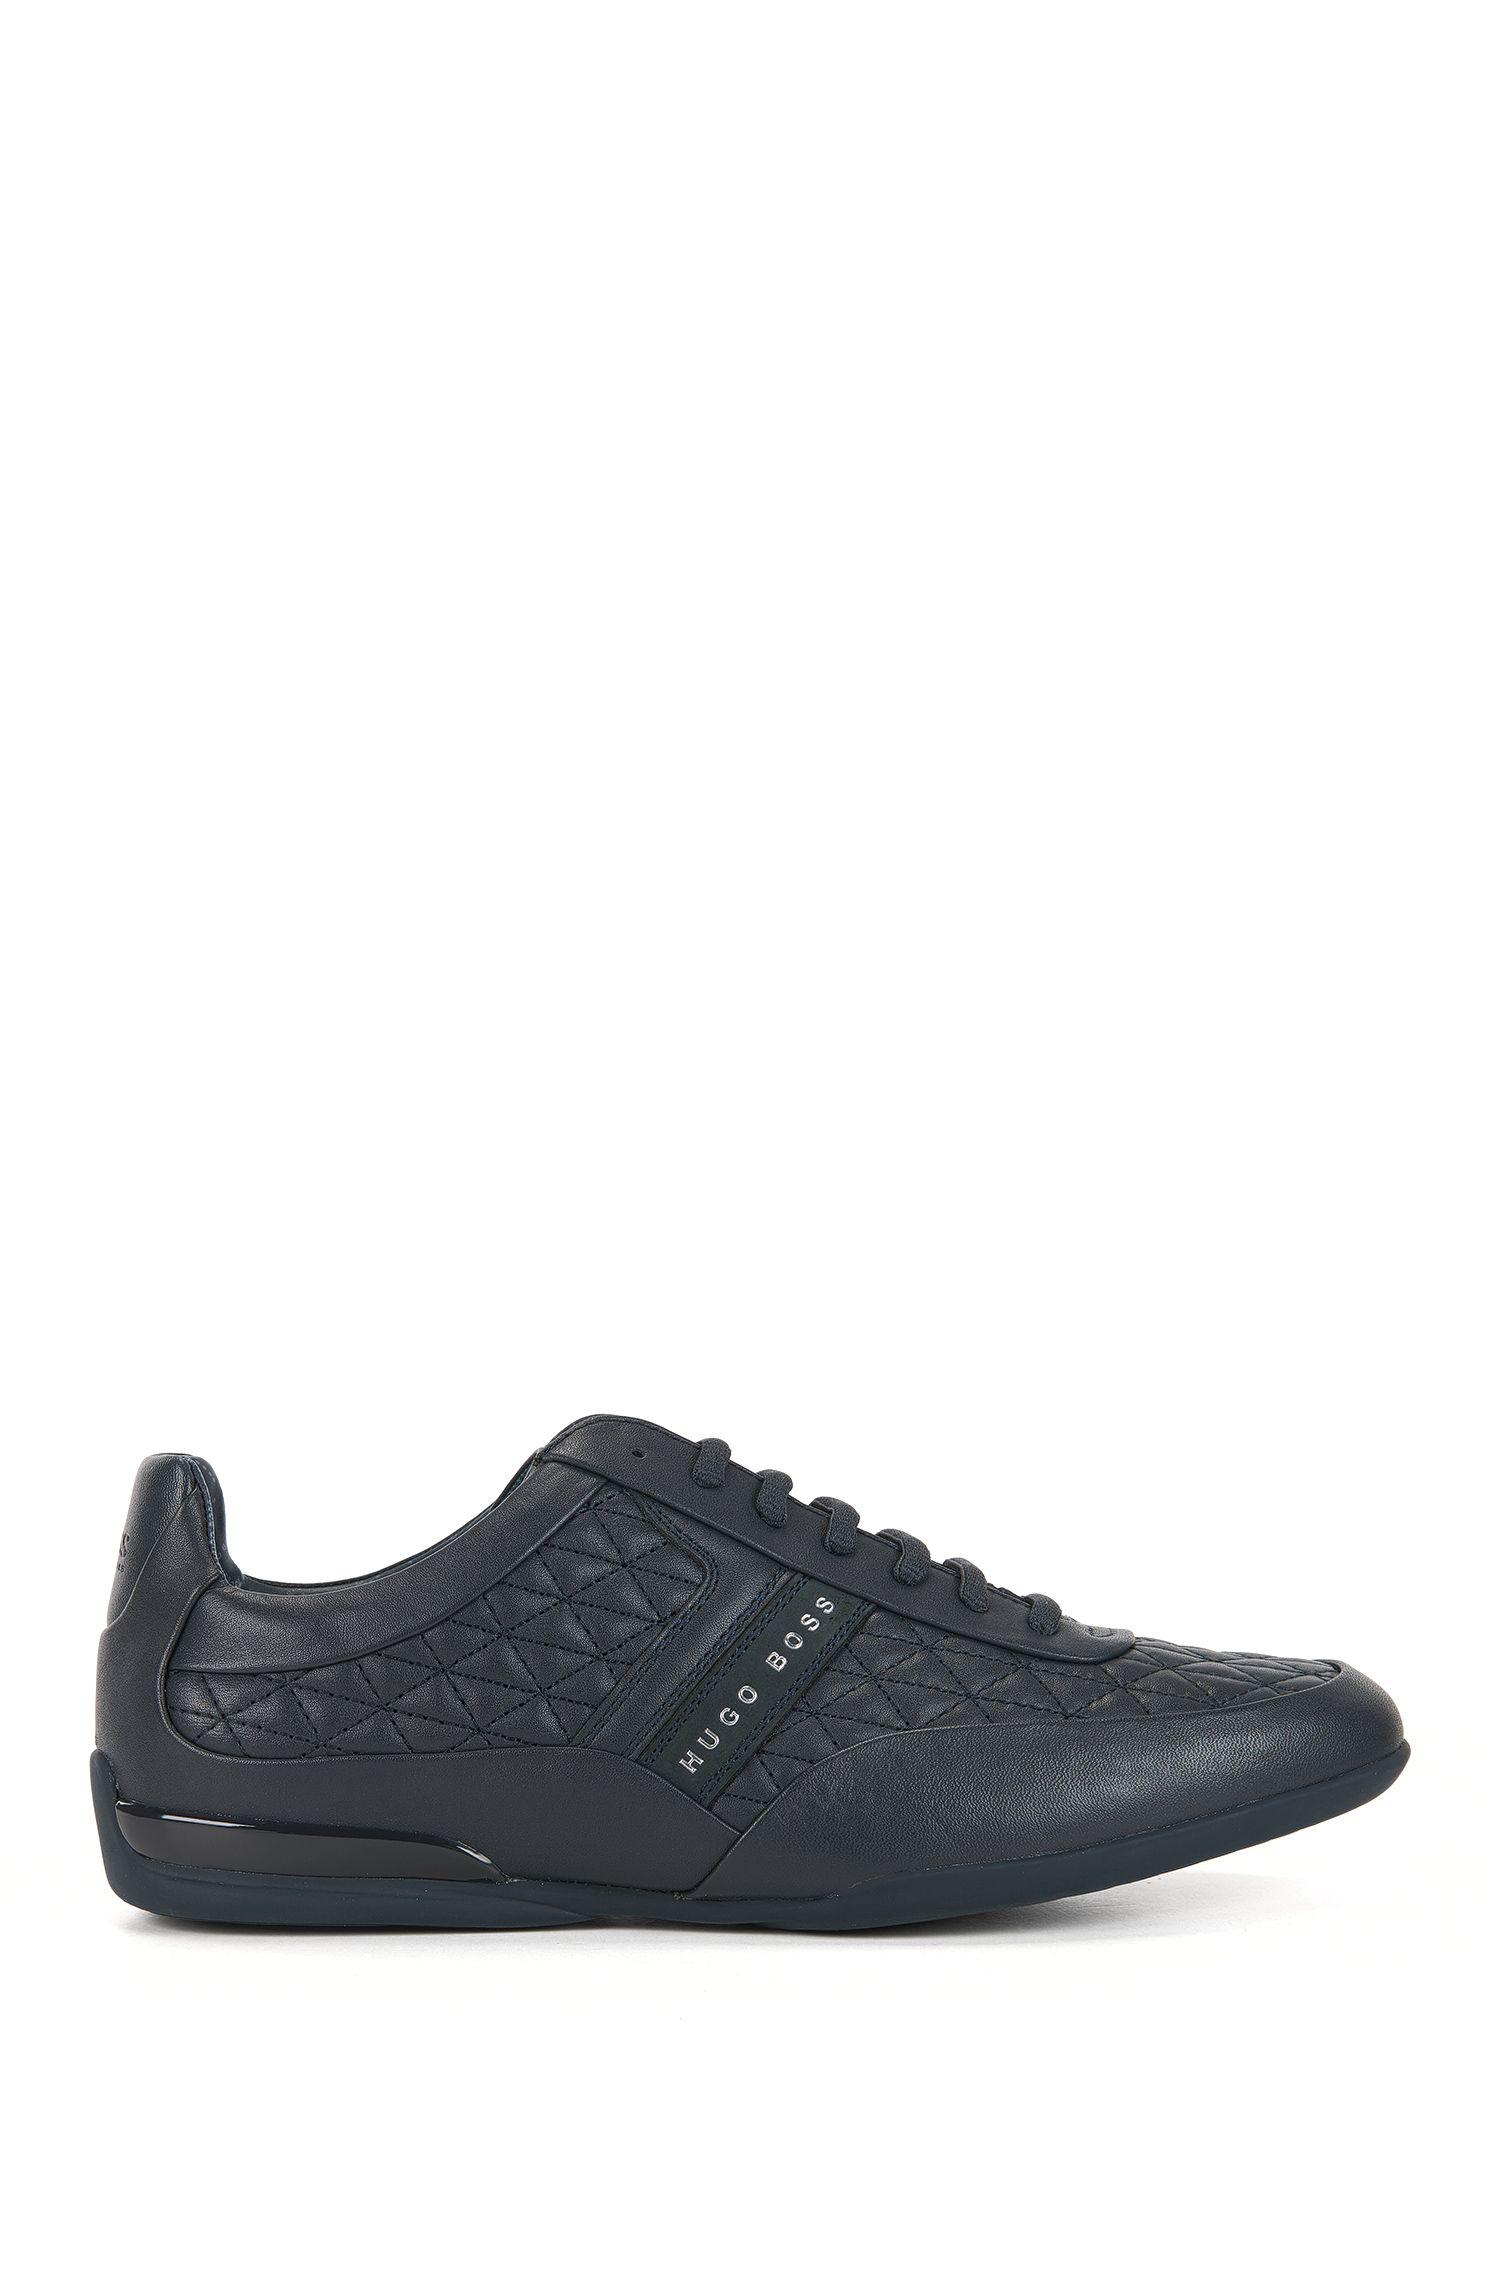 Sneakers low-top in pelle pregiata